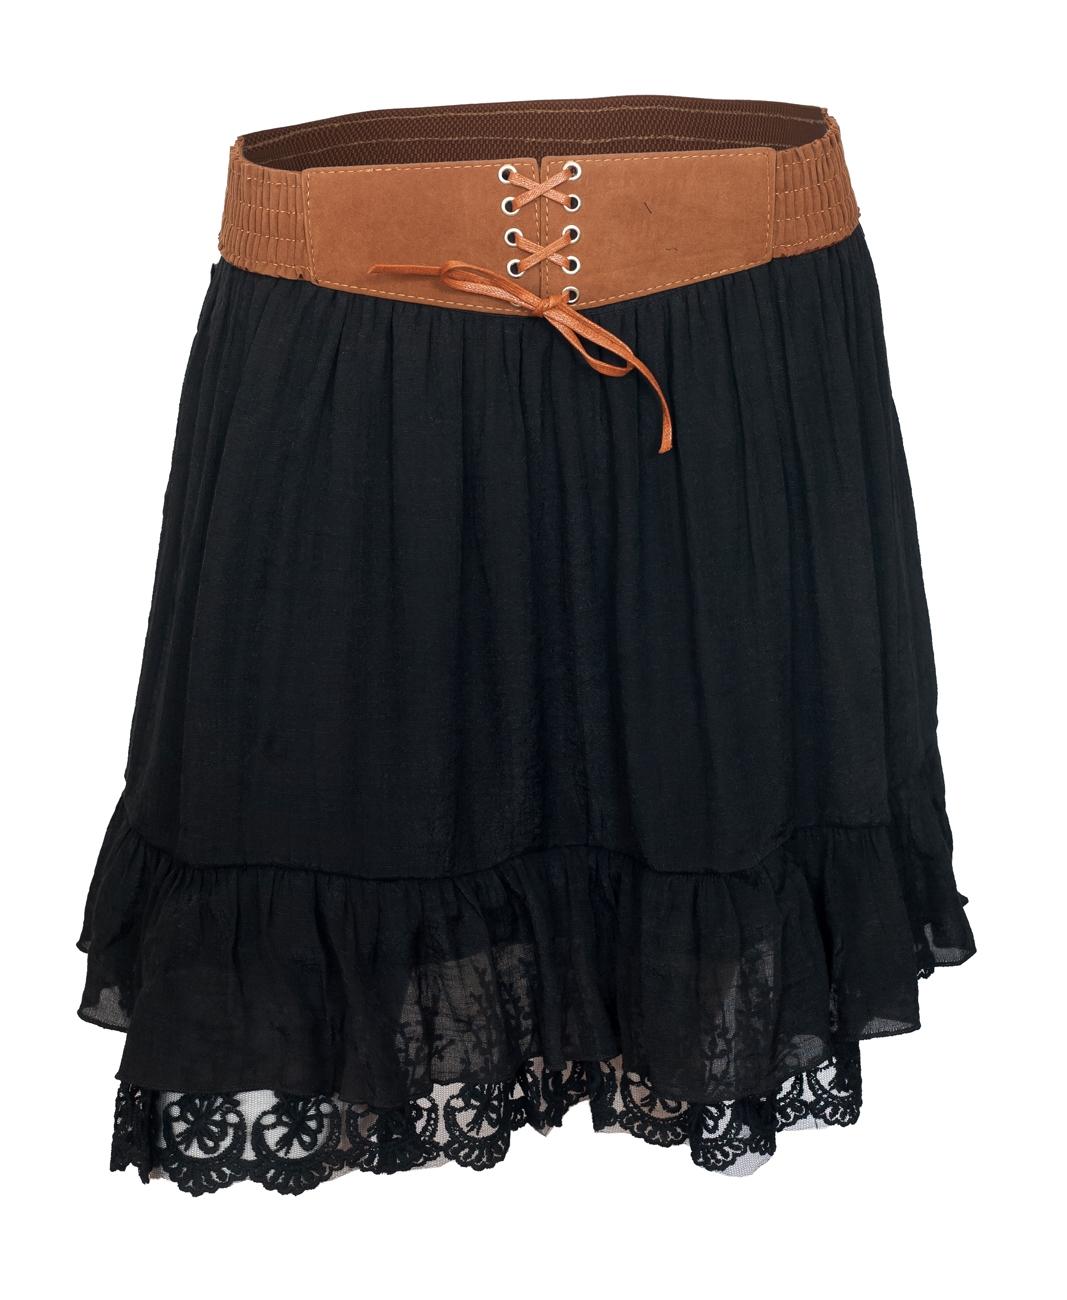 Women's Lace Hem Chiffon Mini Skirt Black